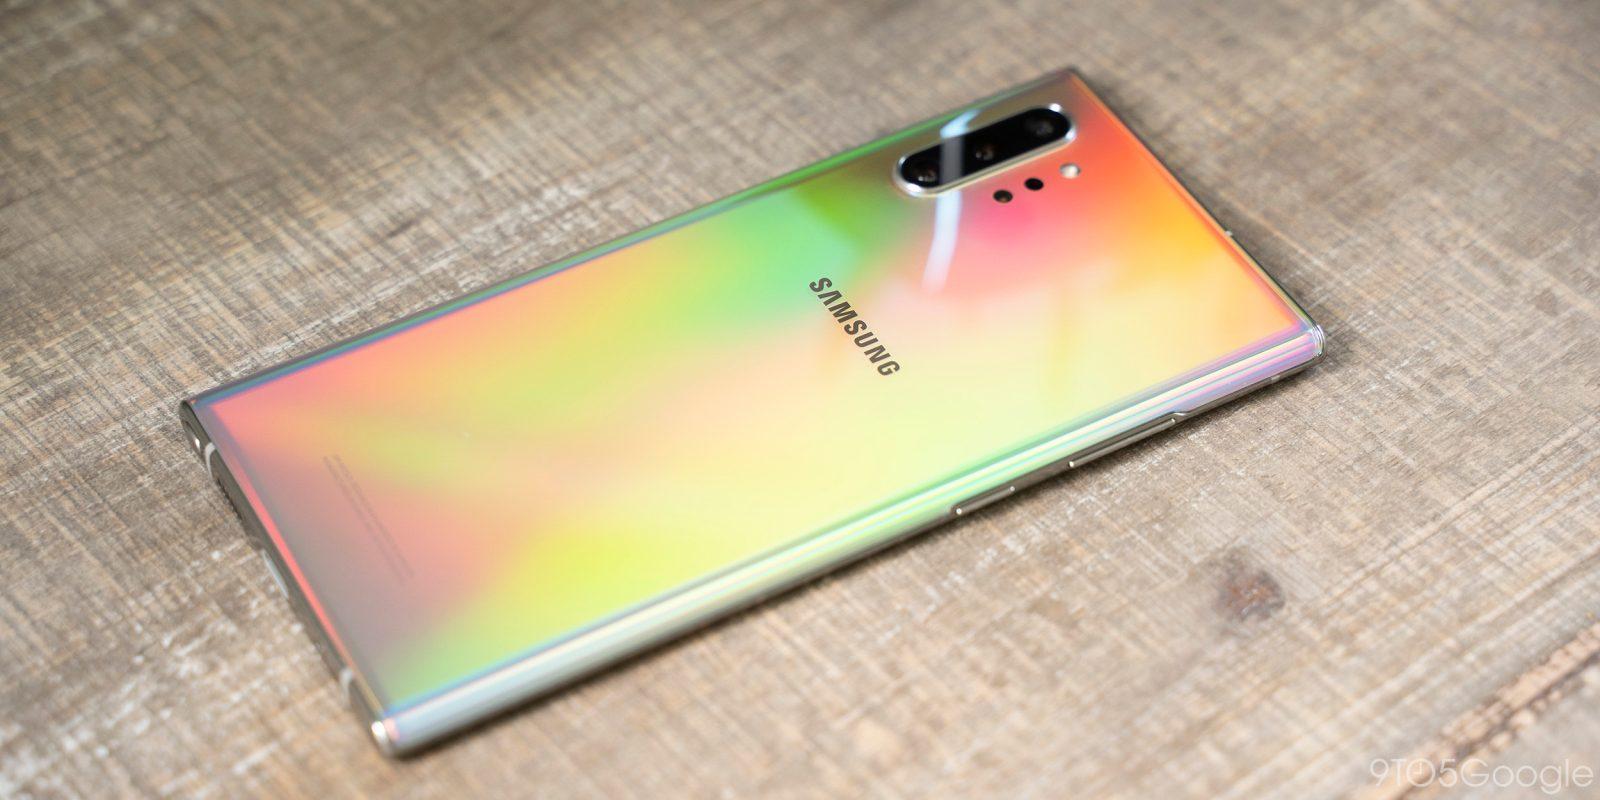 Galaxy Note 10+ teardown reveals better haptics in place of the headphone jack